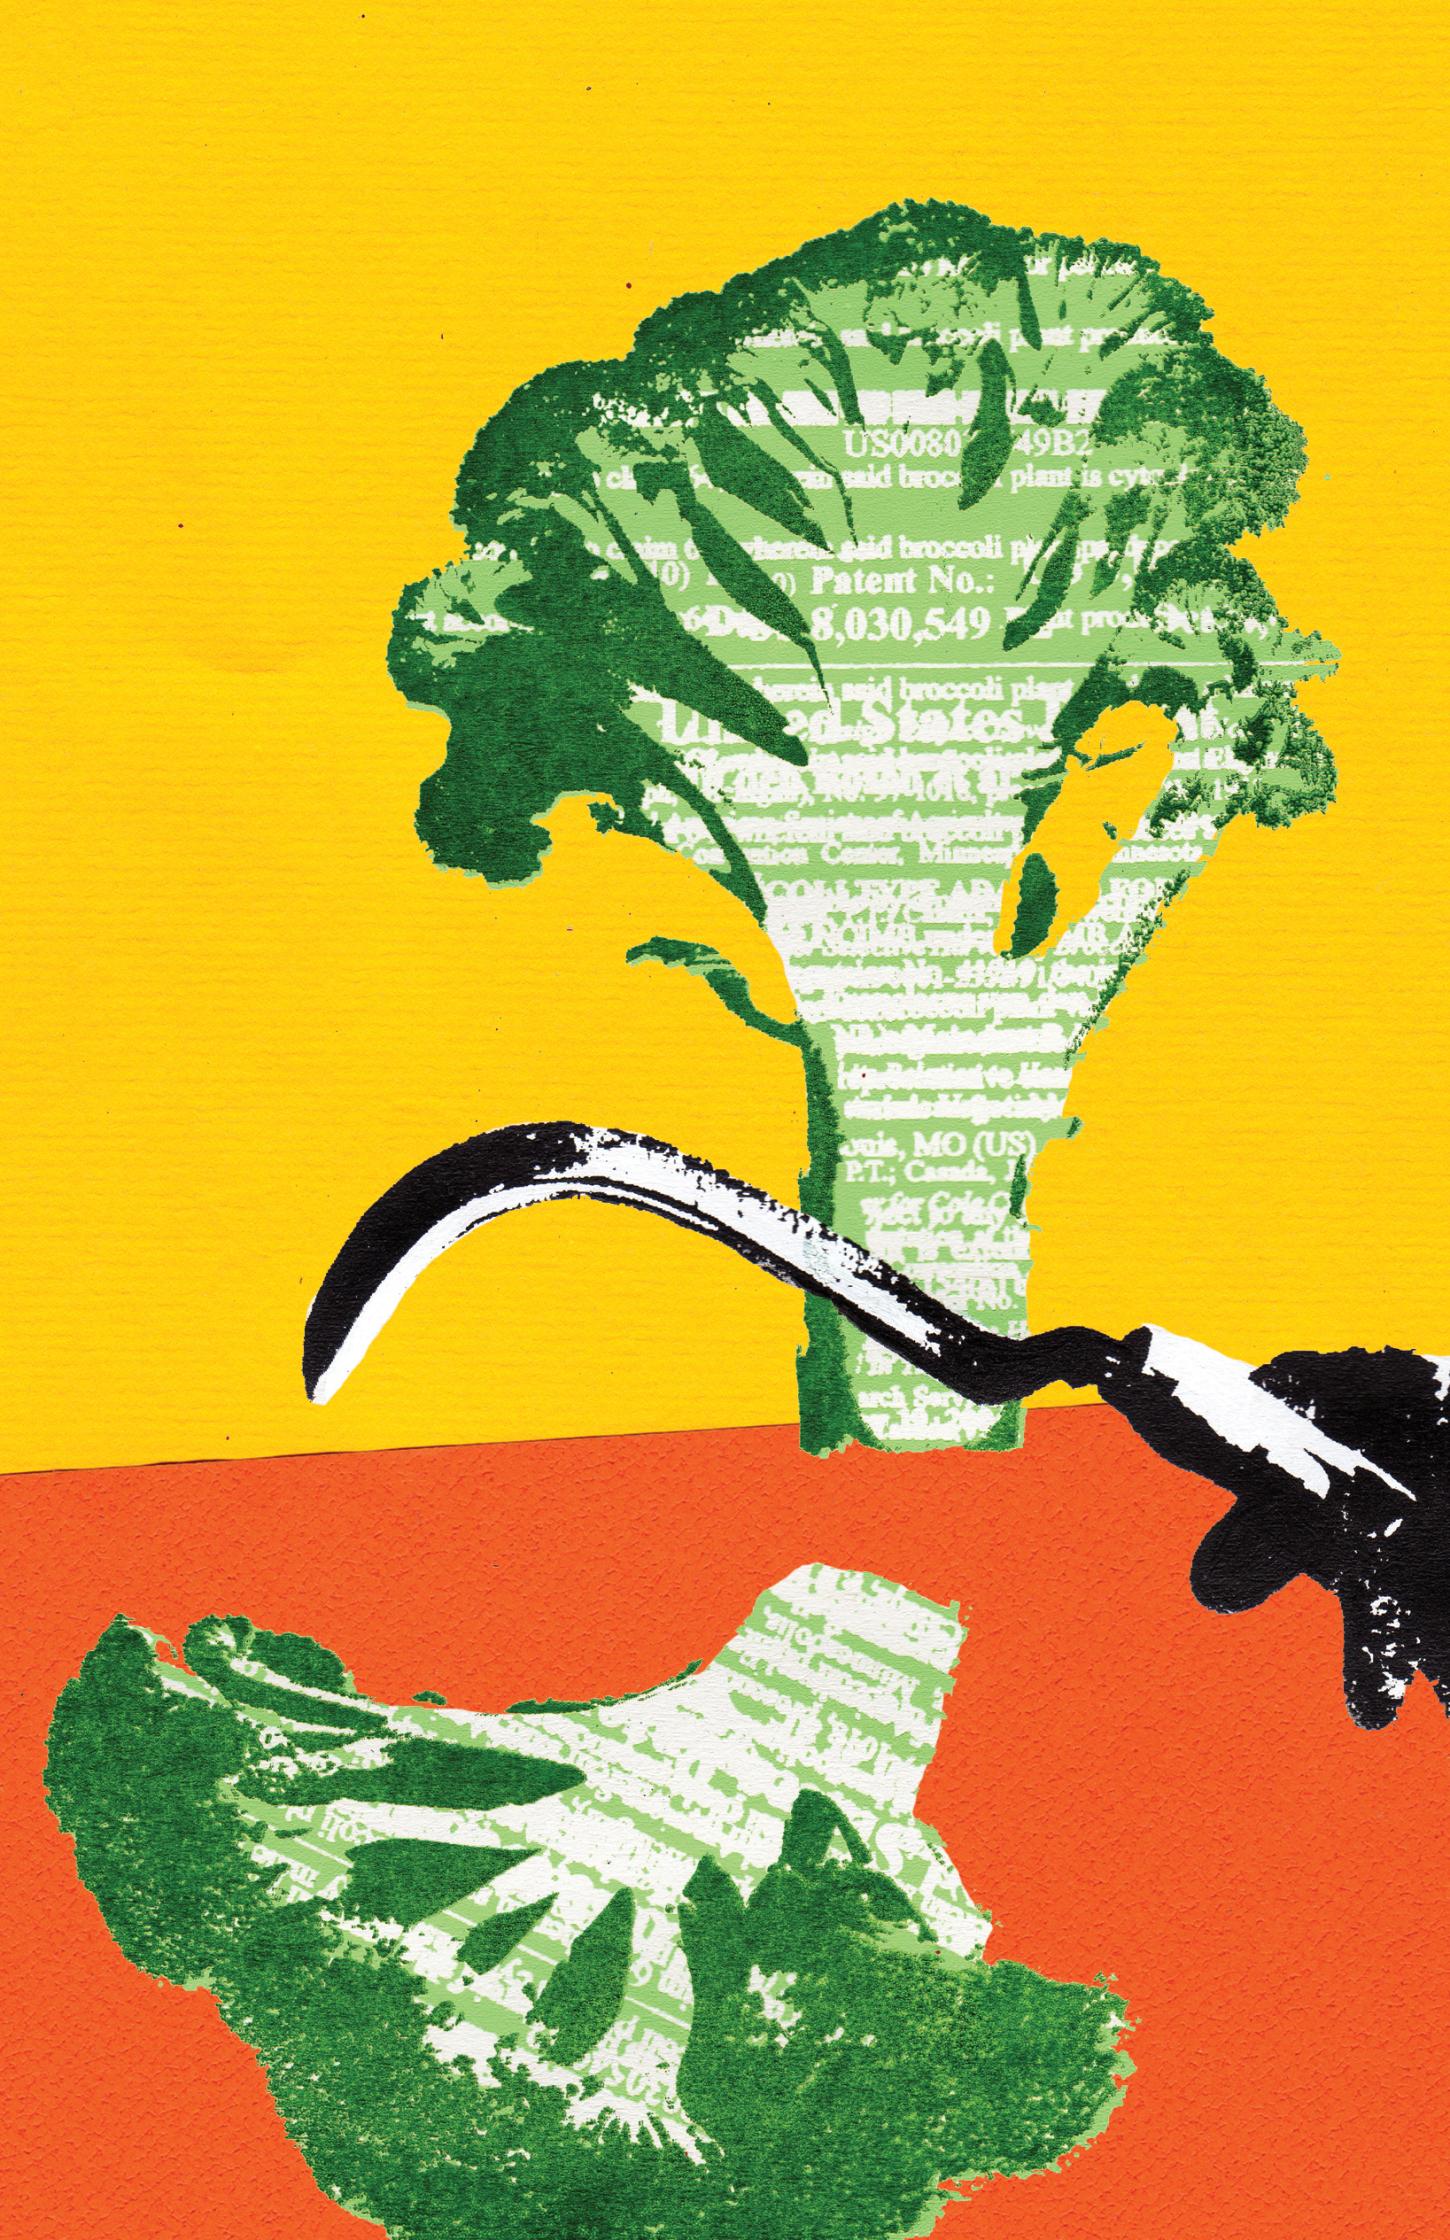 Linux for Lettuce / Virginia Quarterly Review